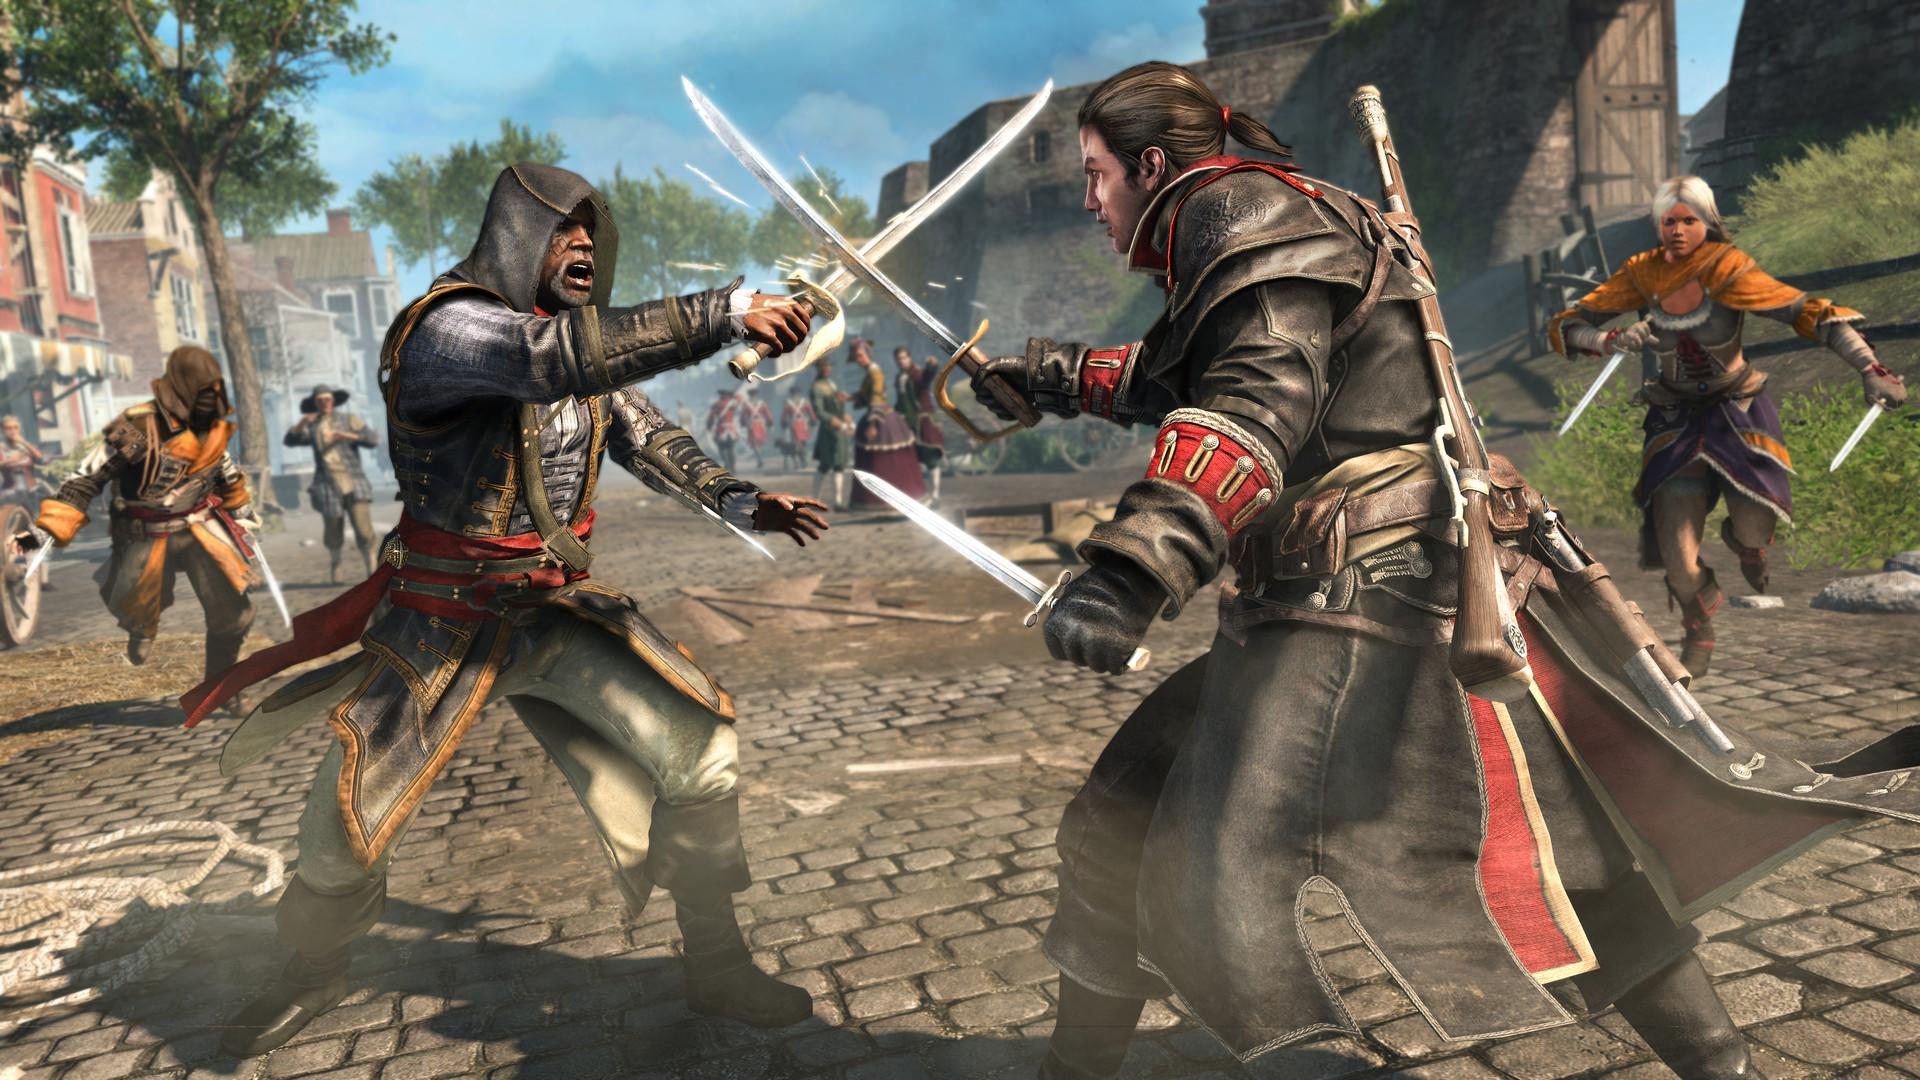 Assassin's Creed: Rogue Screenshot 4